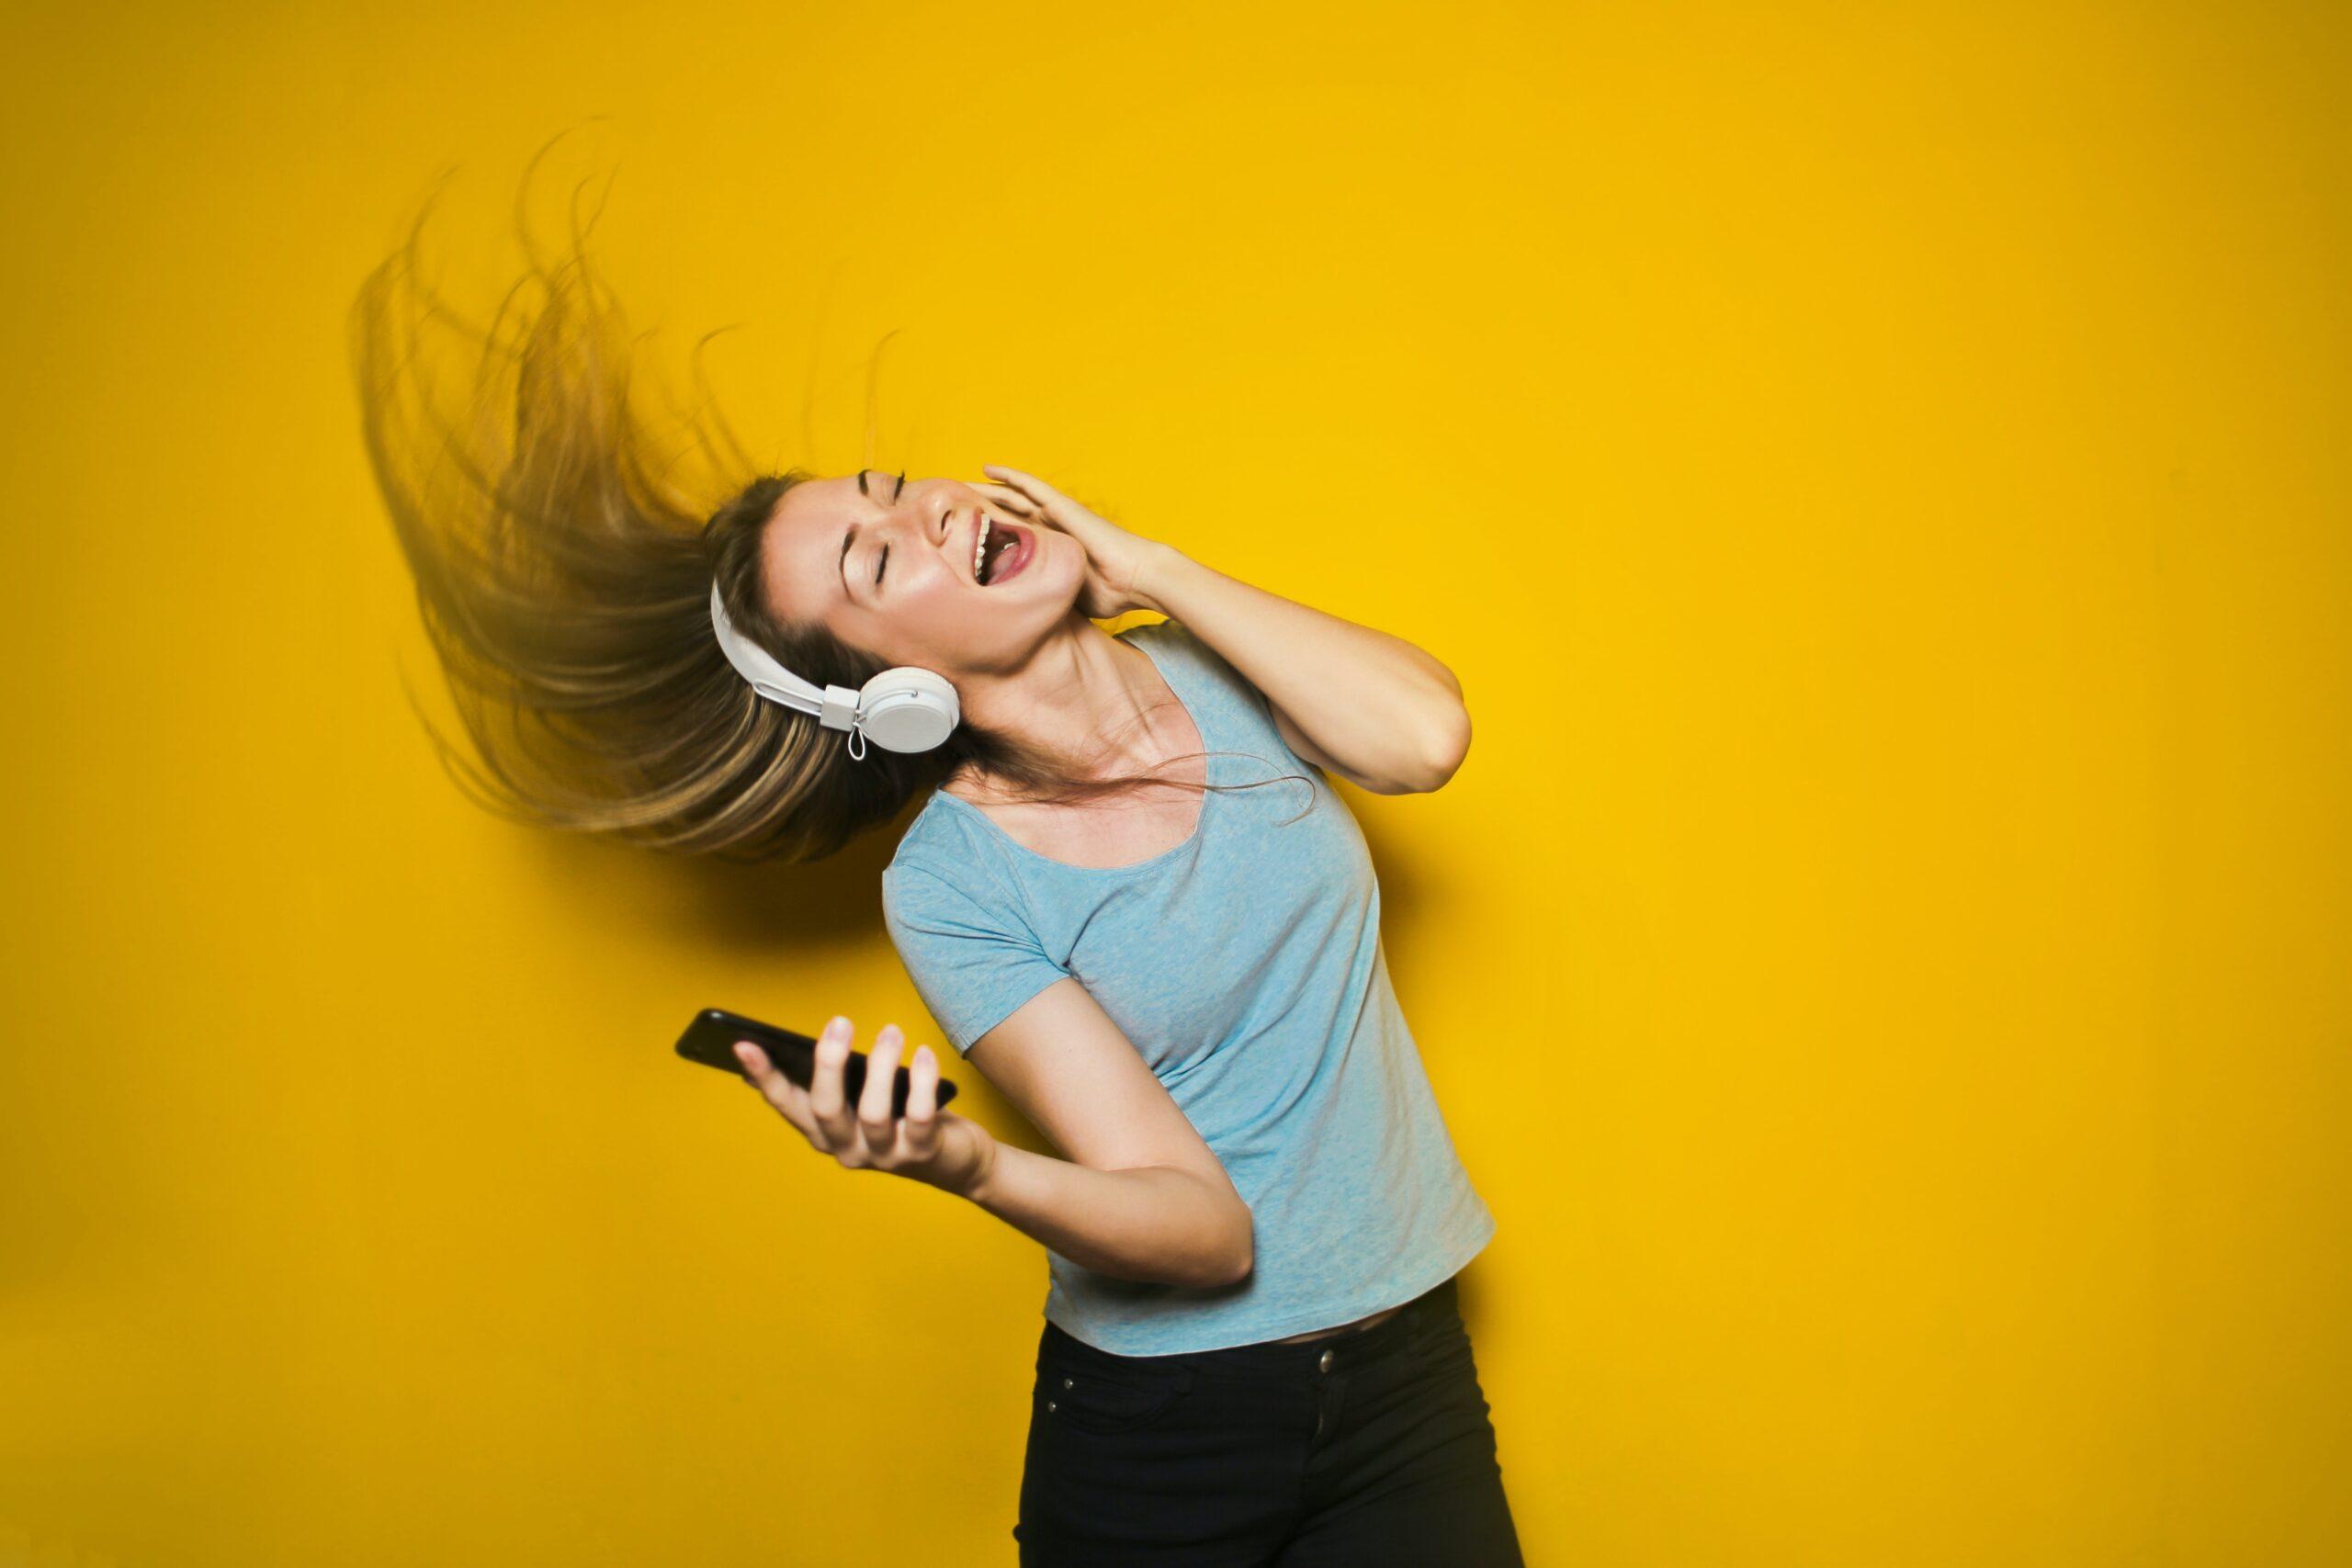 Music to reduce stress